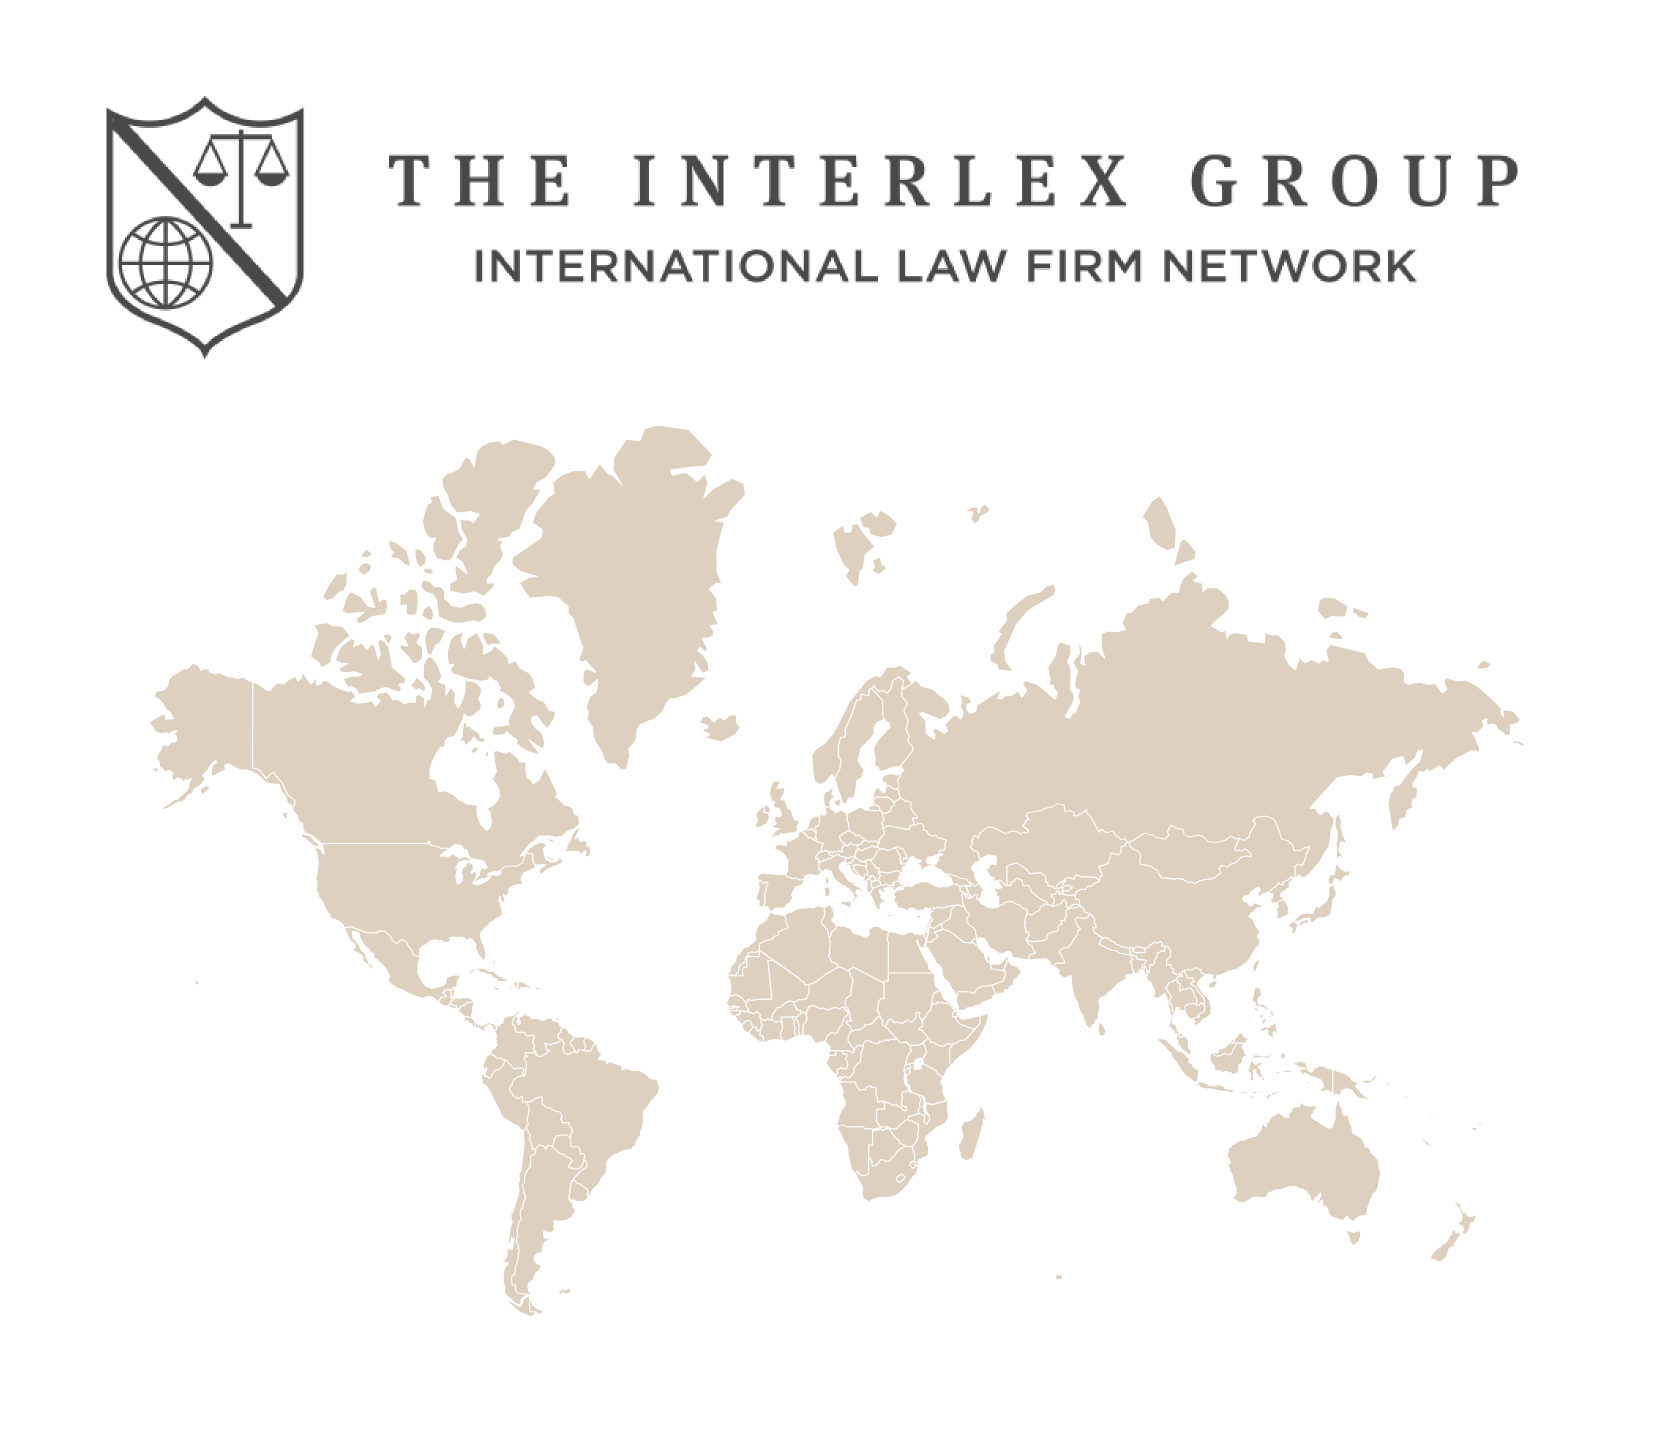 PERREARD DE BOCCARD - Internaltional Lawfirm Geneva & Zurich